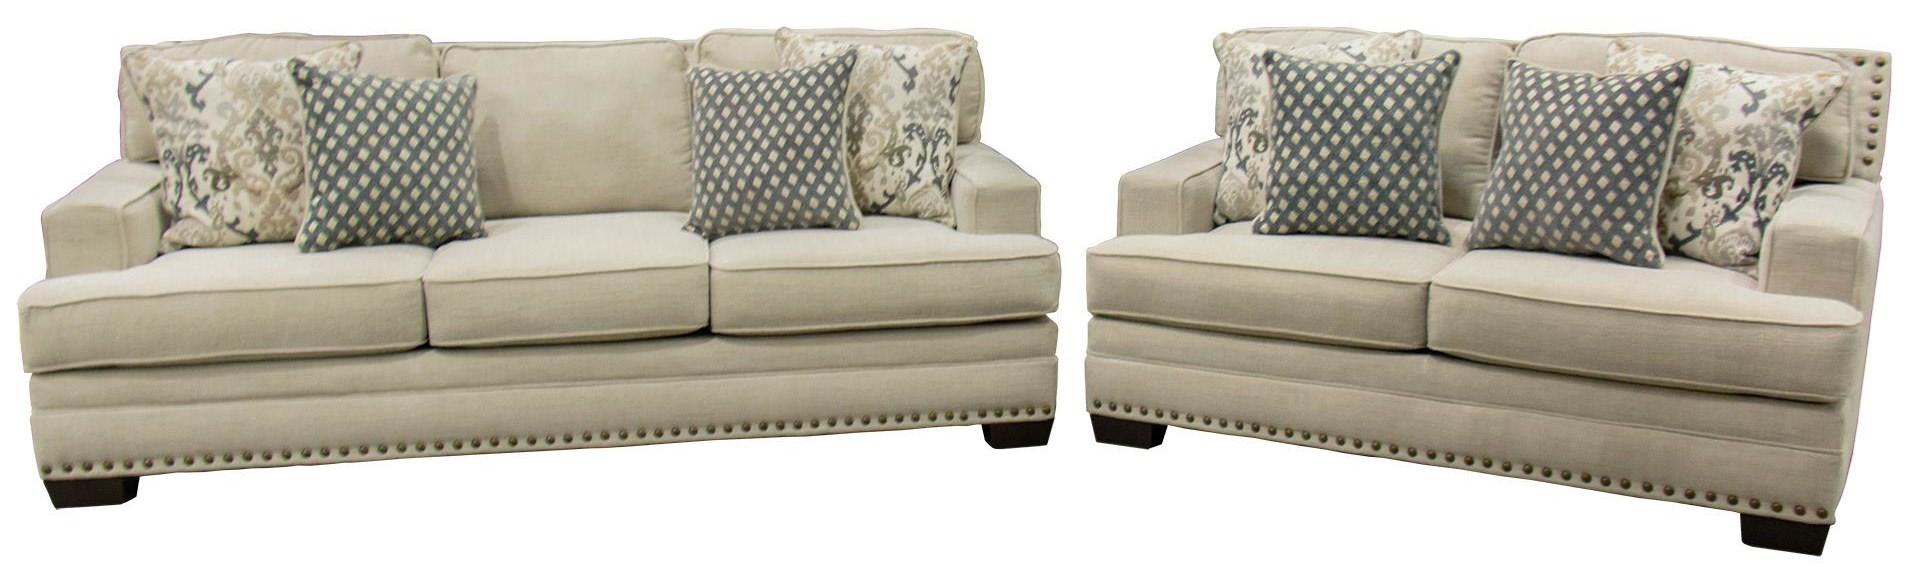 Behold Home Braxton Sofa & Loveseat - Item Number: GRP-1020-SL